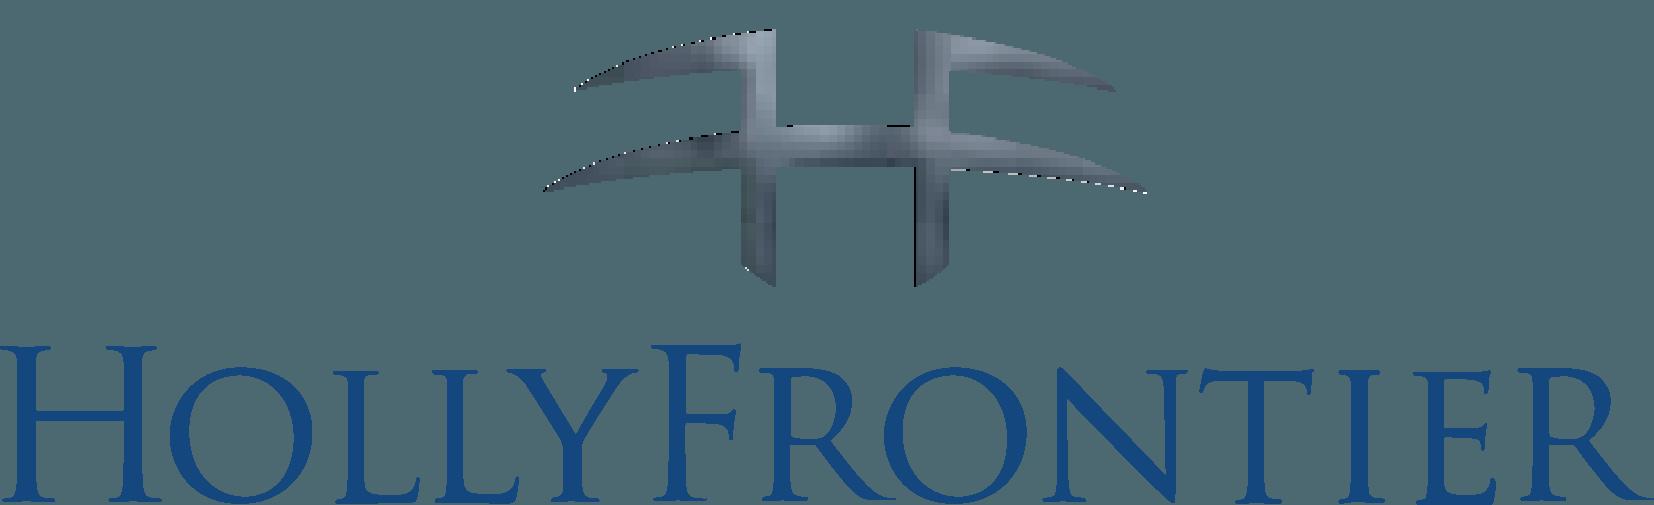 hollyfrontier logo free vector download